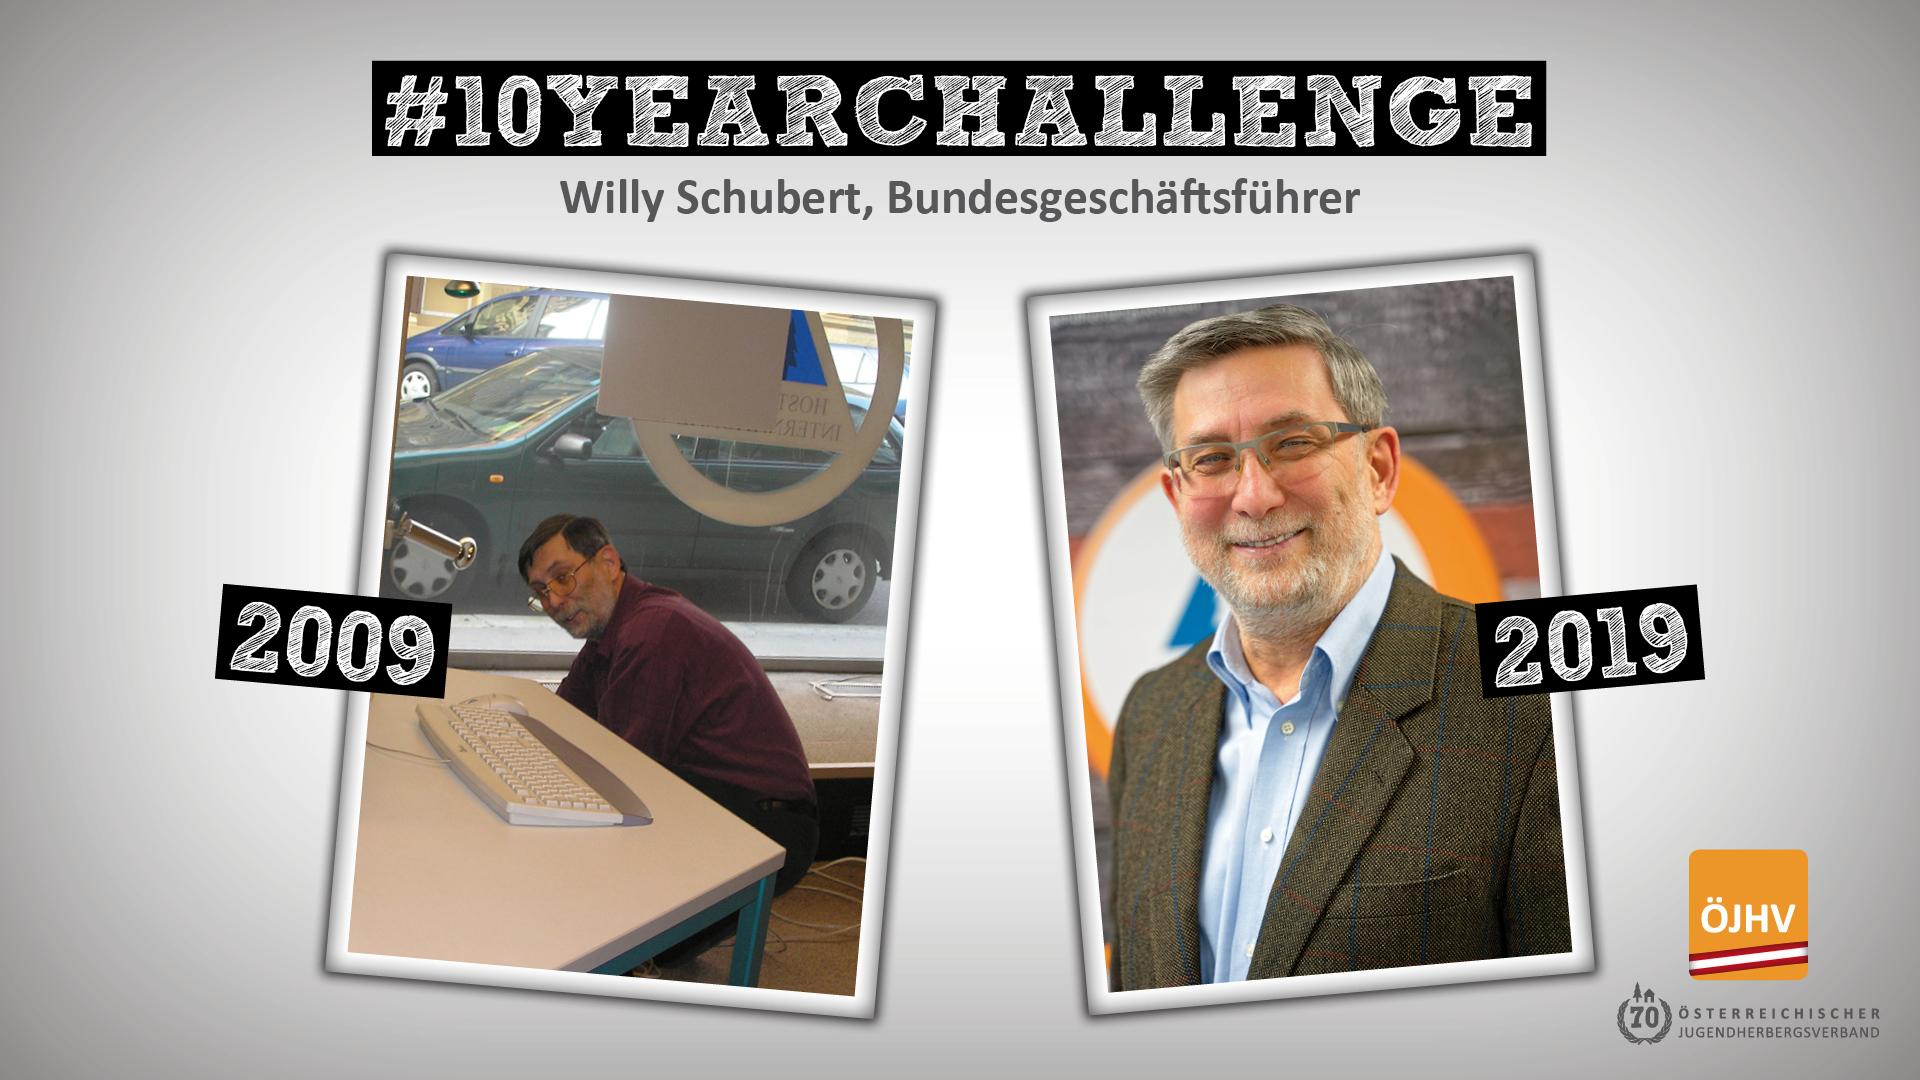 Jugendherbergsverband #10YearChallenge Willy Schubert